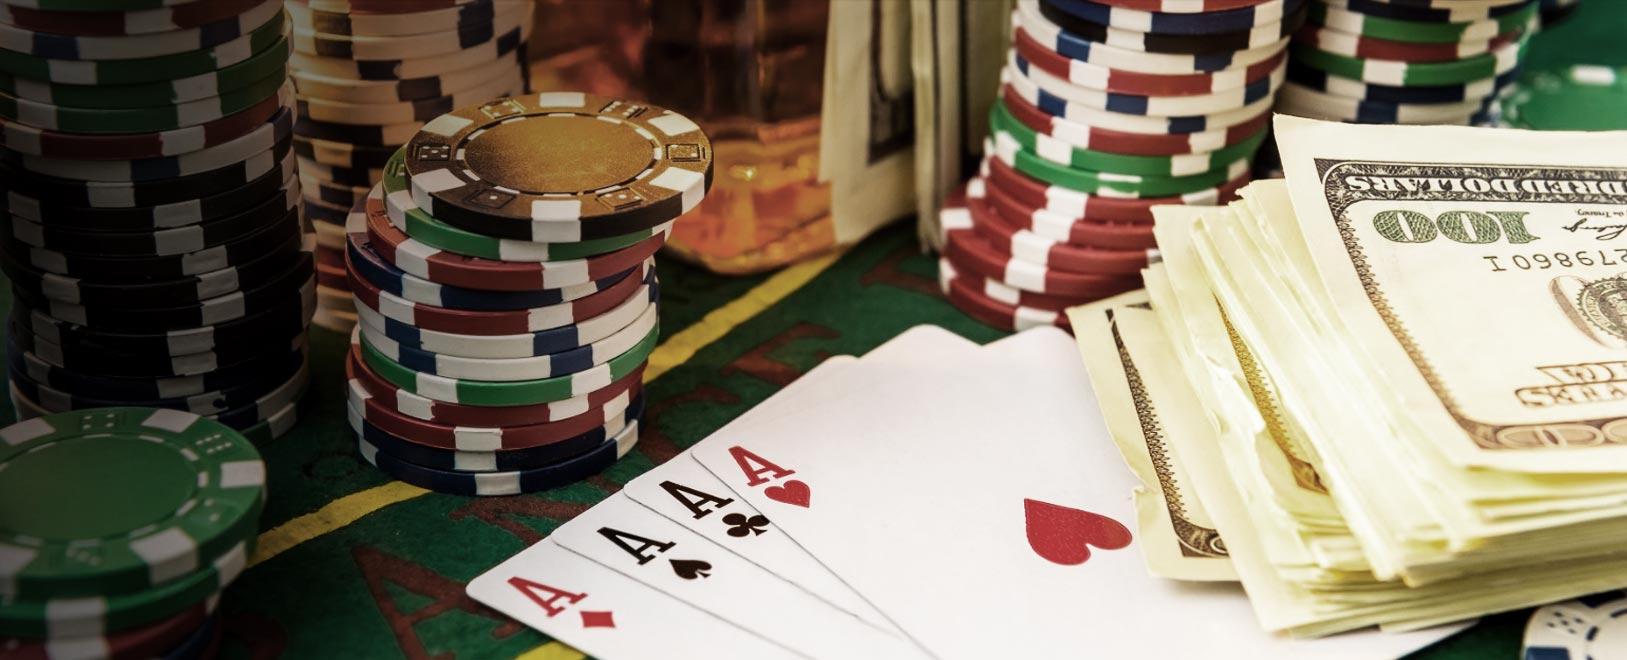 Bodog Poker: Betting with Bonuses